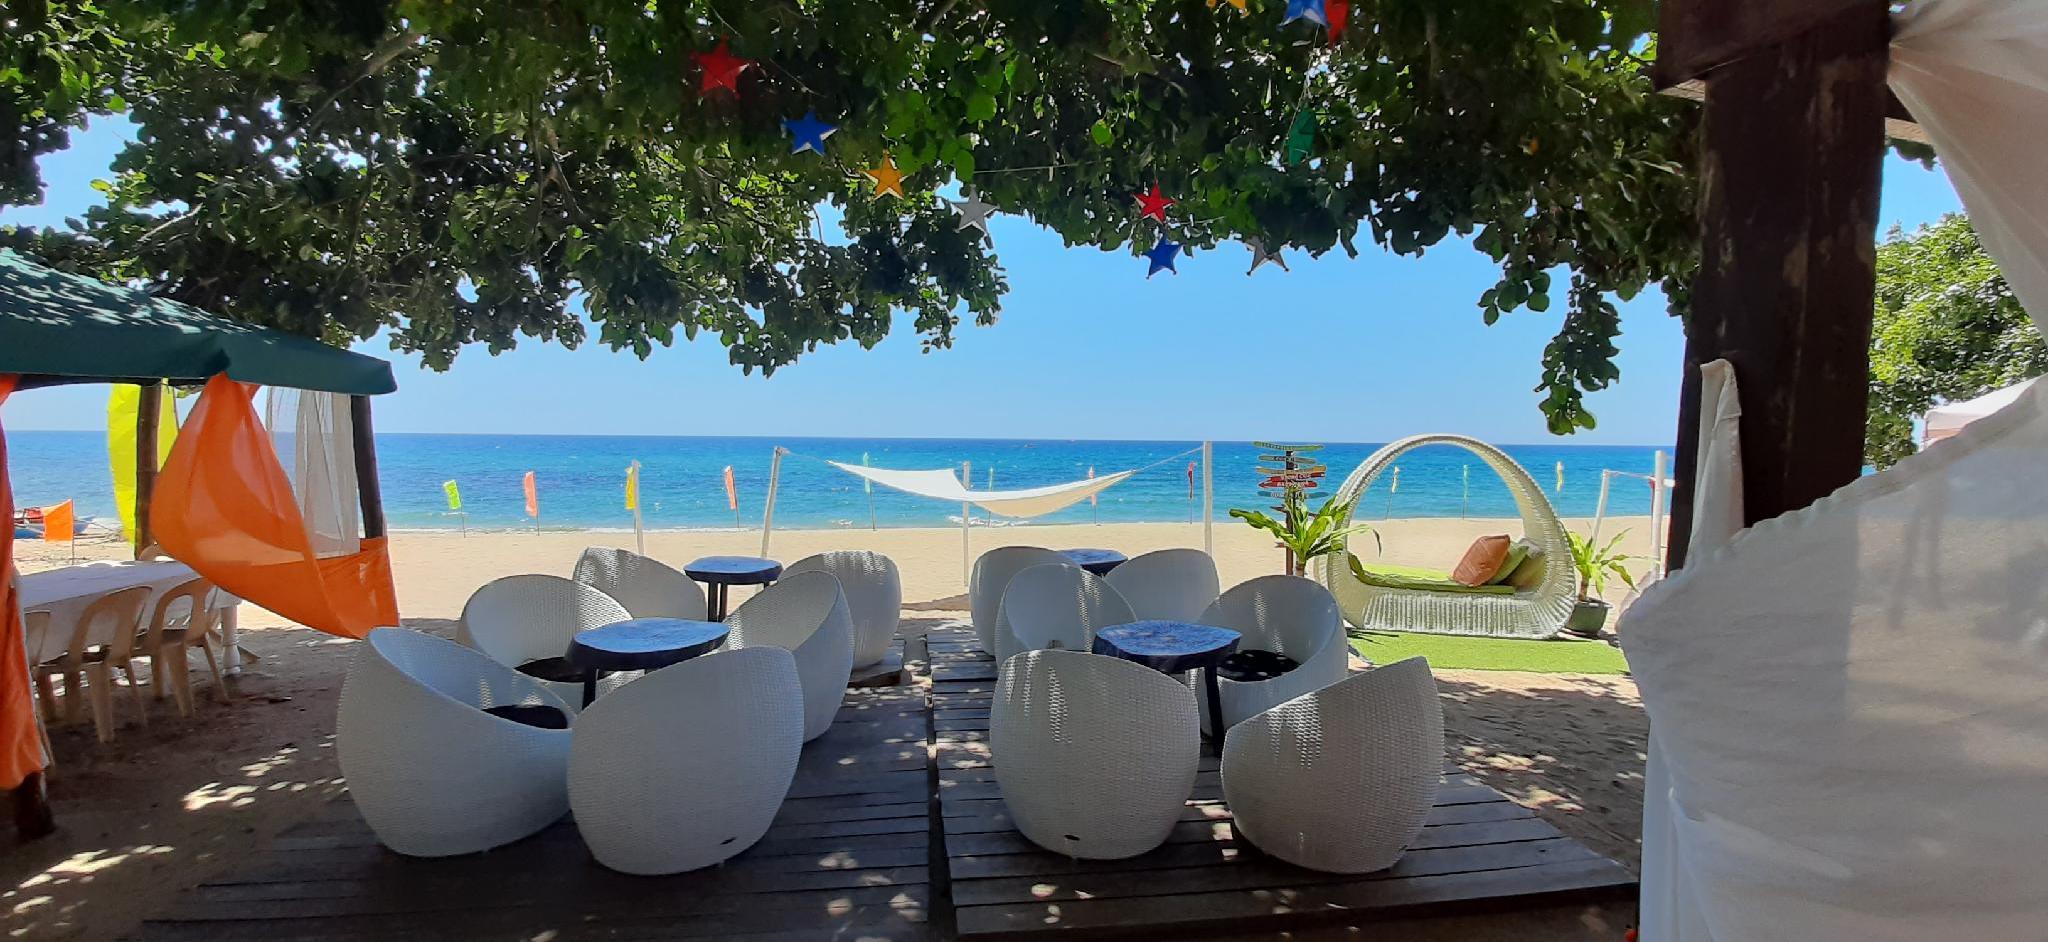 Brazaville Beach Resort